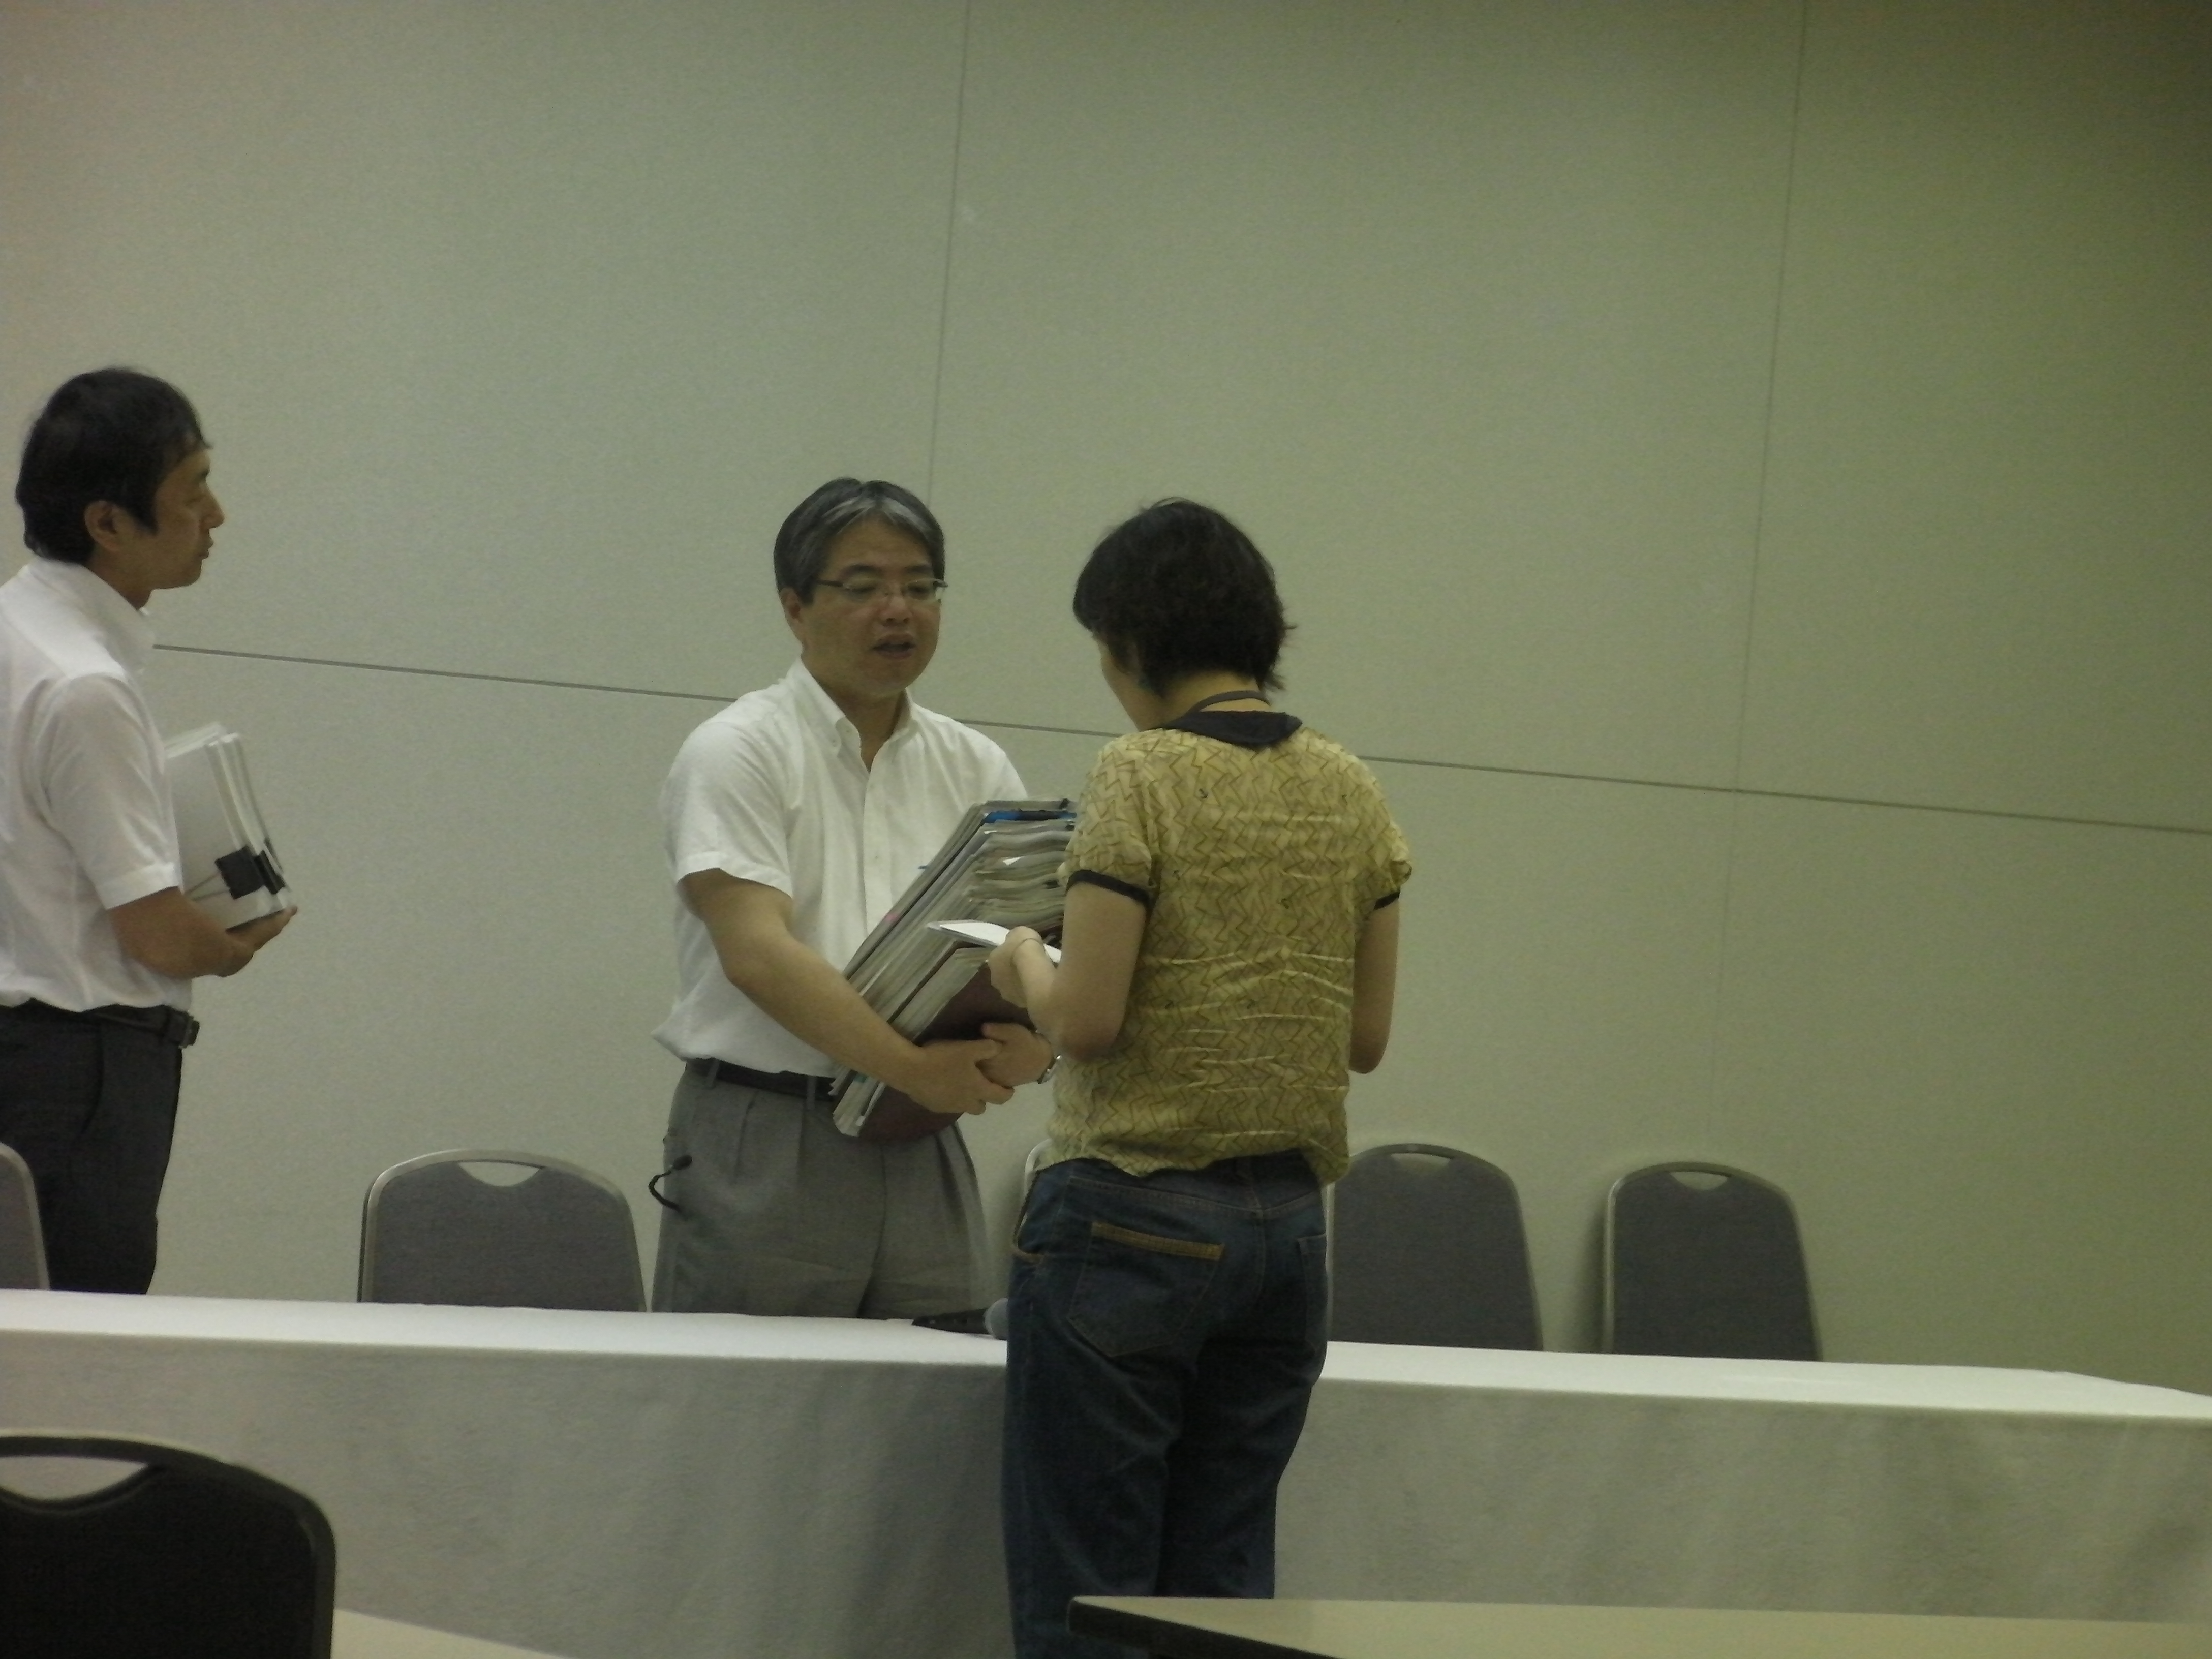 http://daily.magazine9.jp/m9/oshidori/SANY0414.JPG